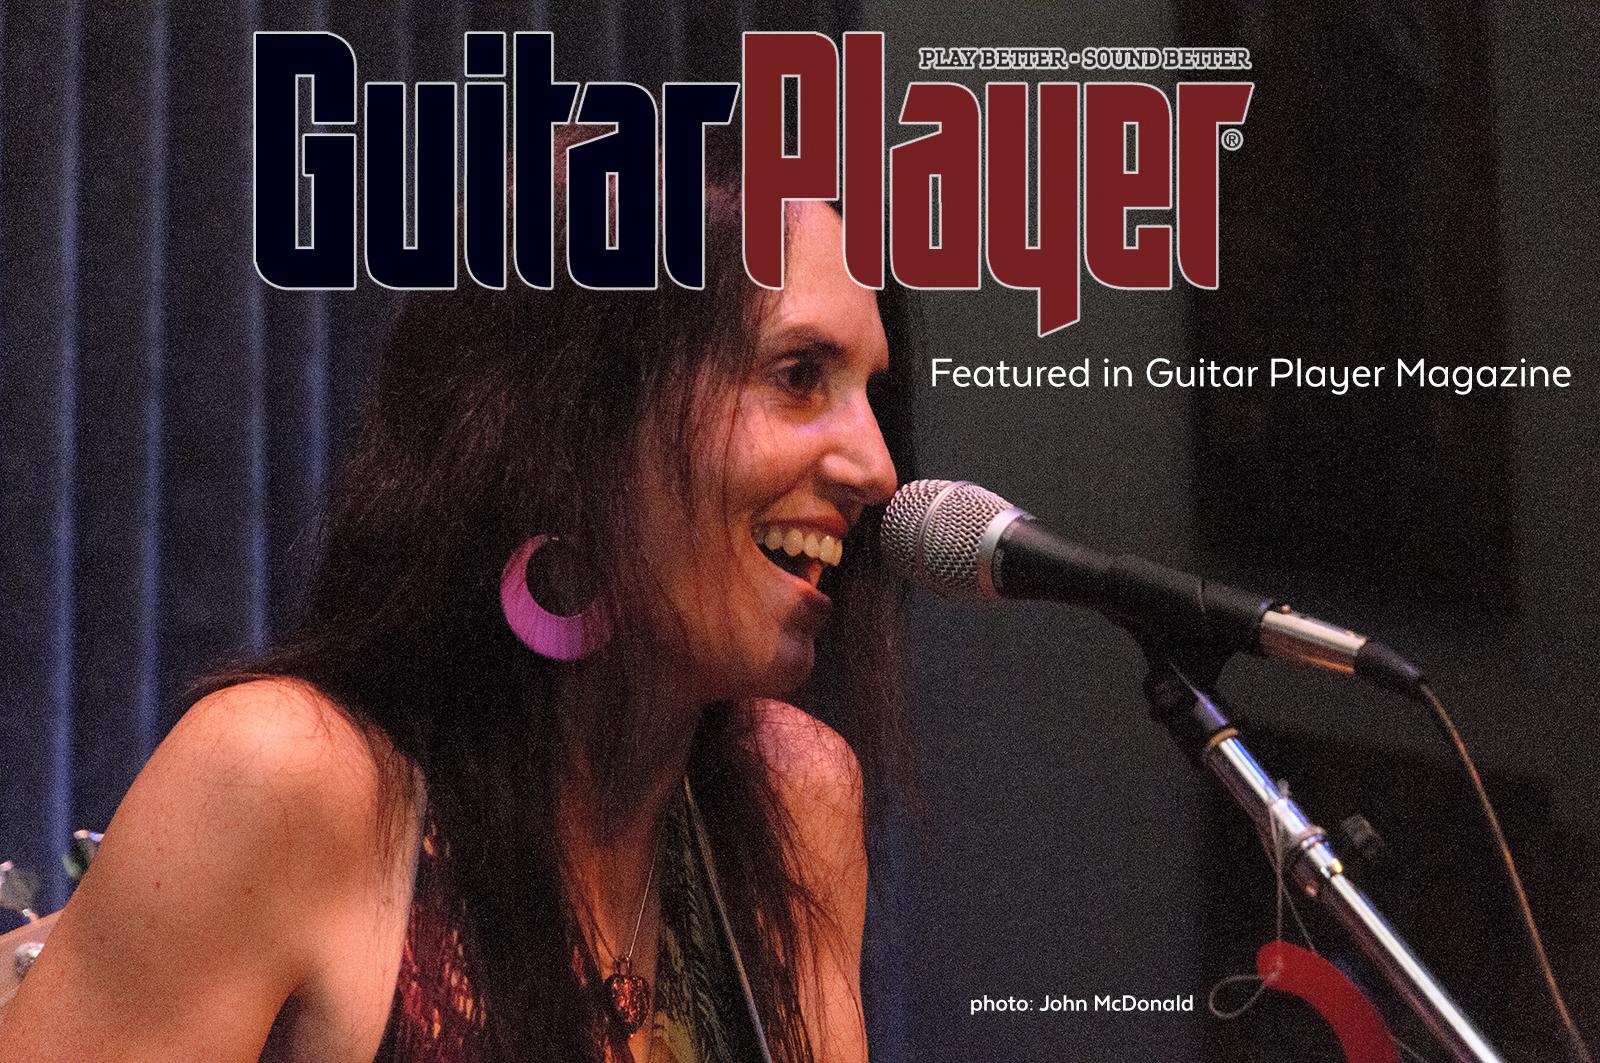 Guitar Player Magazine promo